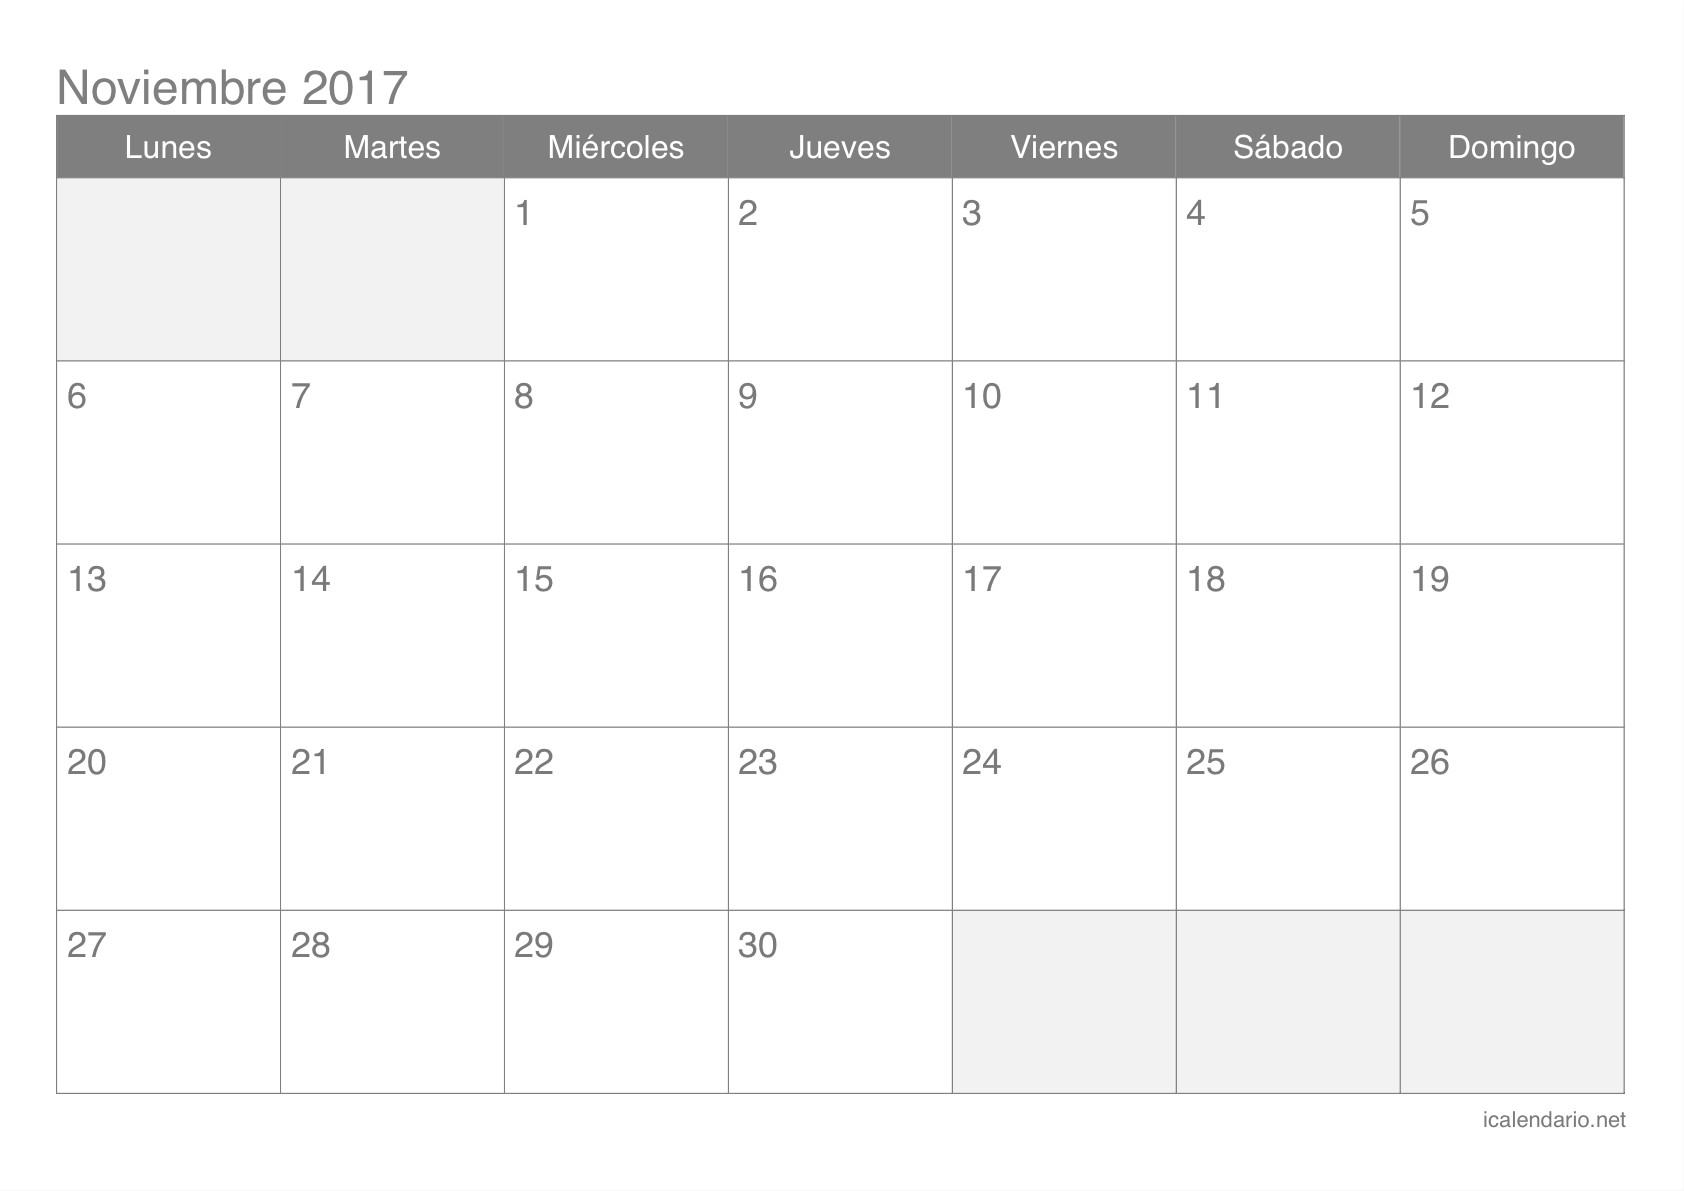 Calendario Noviembre 2019 Argentina Para Imprimir Más Recientes Calendario Noviembre 2017 Para Imprimir Icalendario Of Calendario Noviembre 2019 Argentina Para Imprimir Más Recientes Calendario Chile A±o 2019